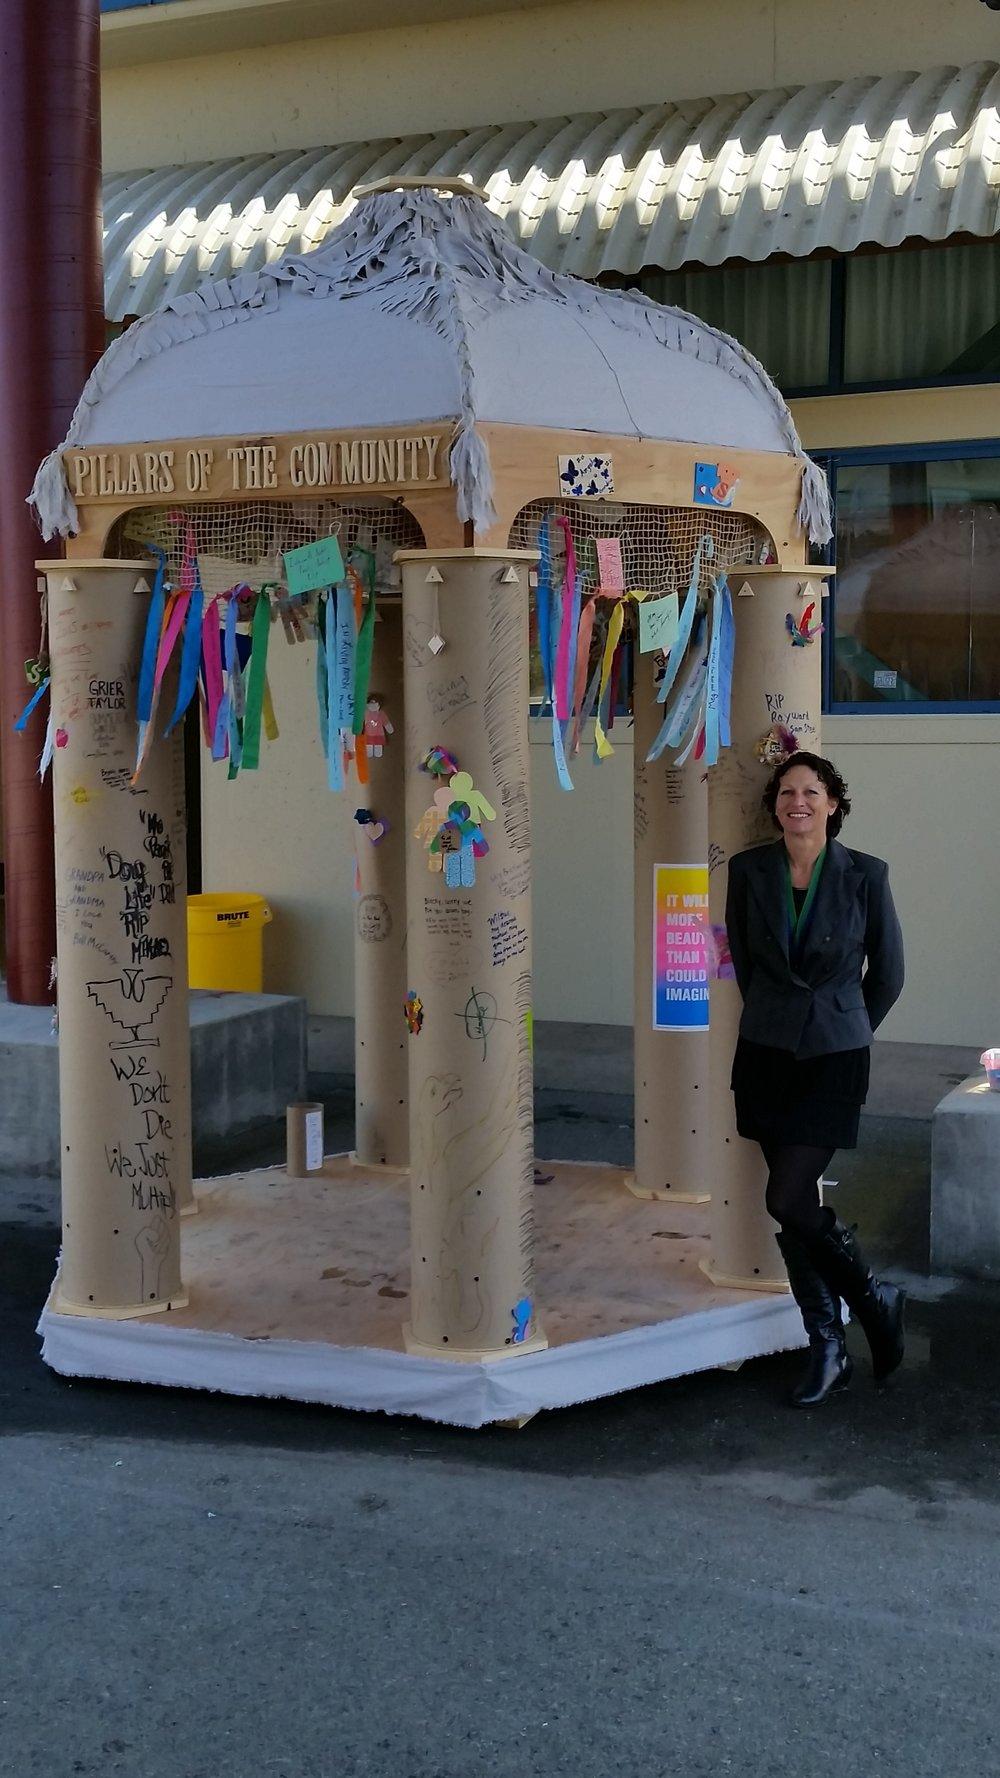 Pillars of the Community - Participatory memorial temple. Concept, design, fabrication, workshops, bonfire event.